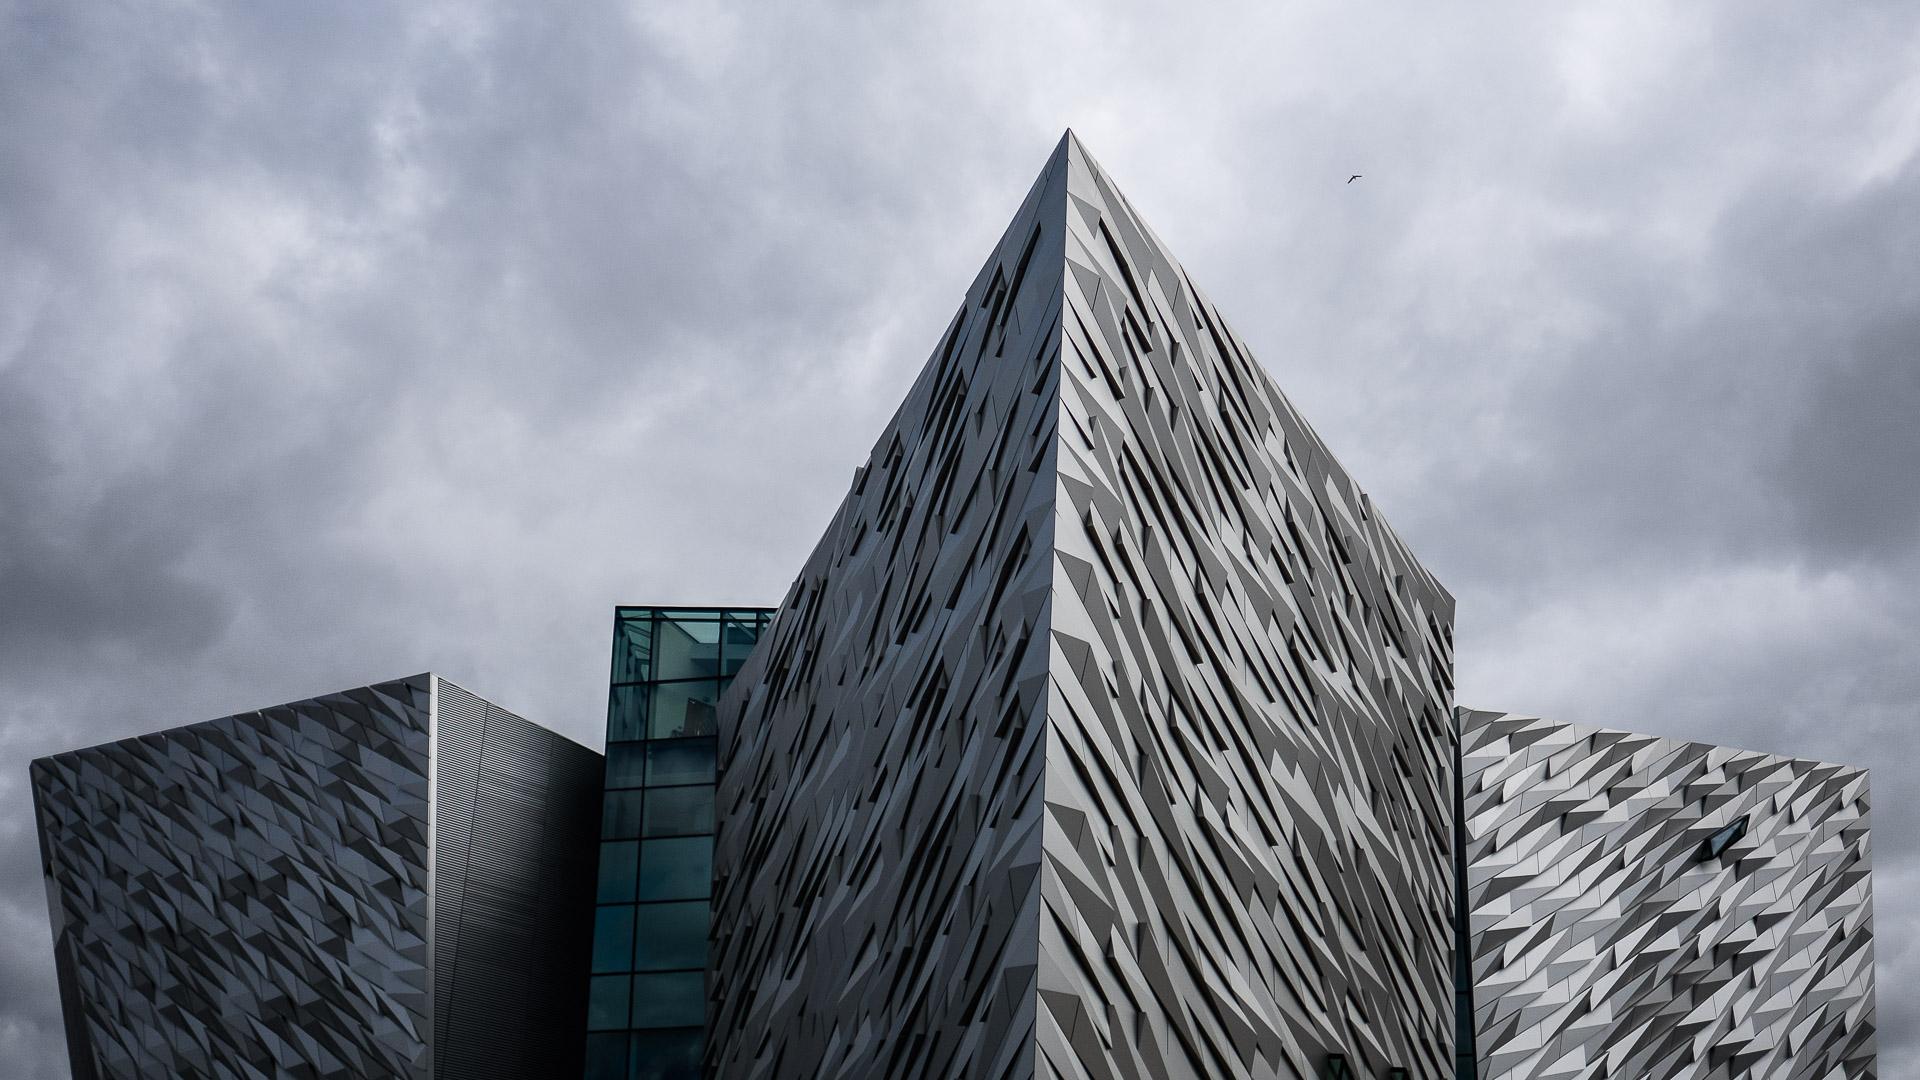 160417-Ireland-Belfast-57-1080.jpg